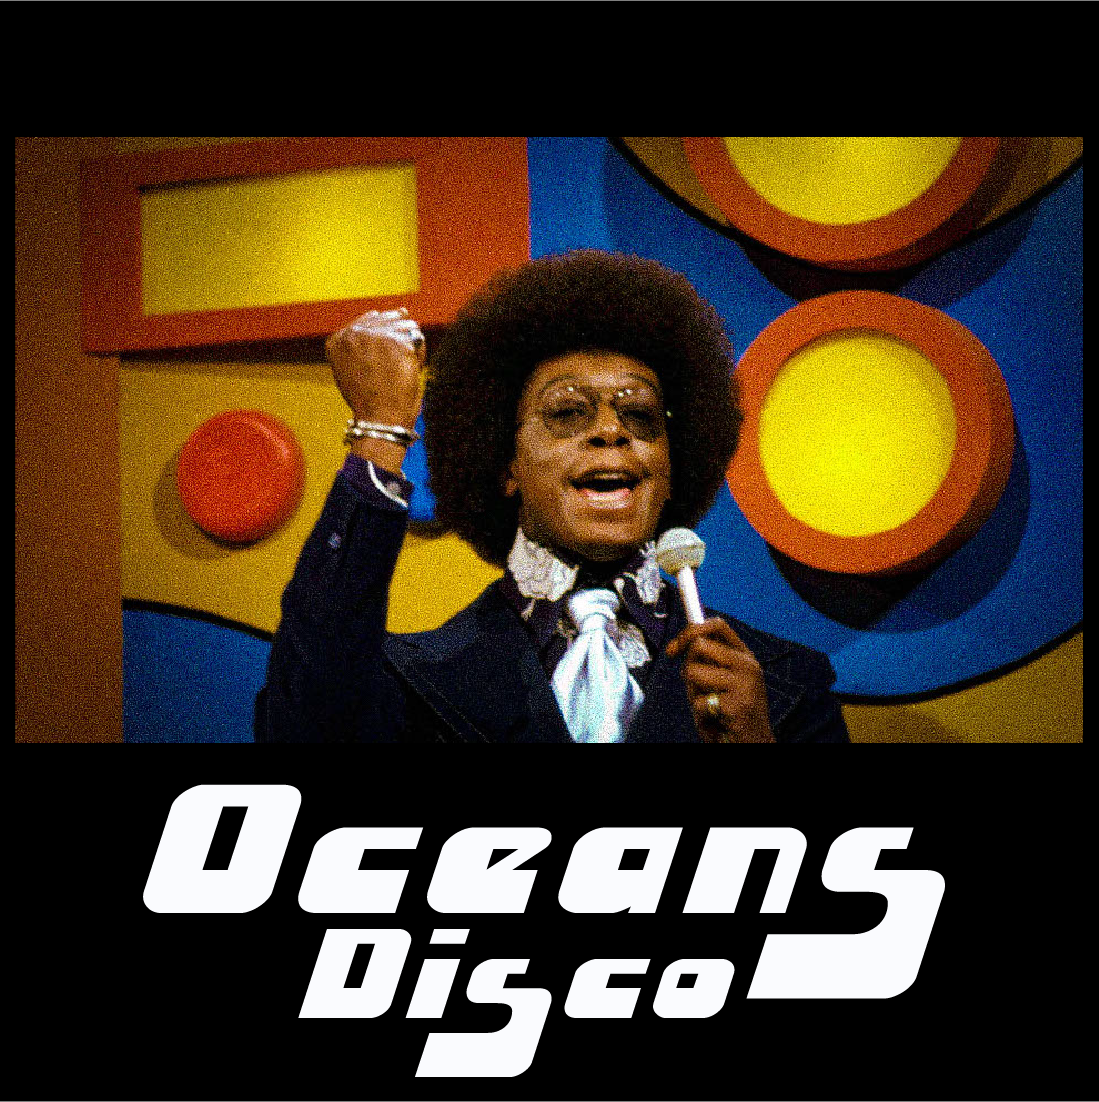 Oceans Disco (2).png